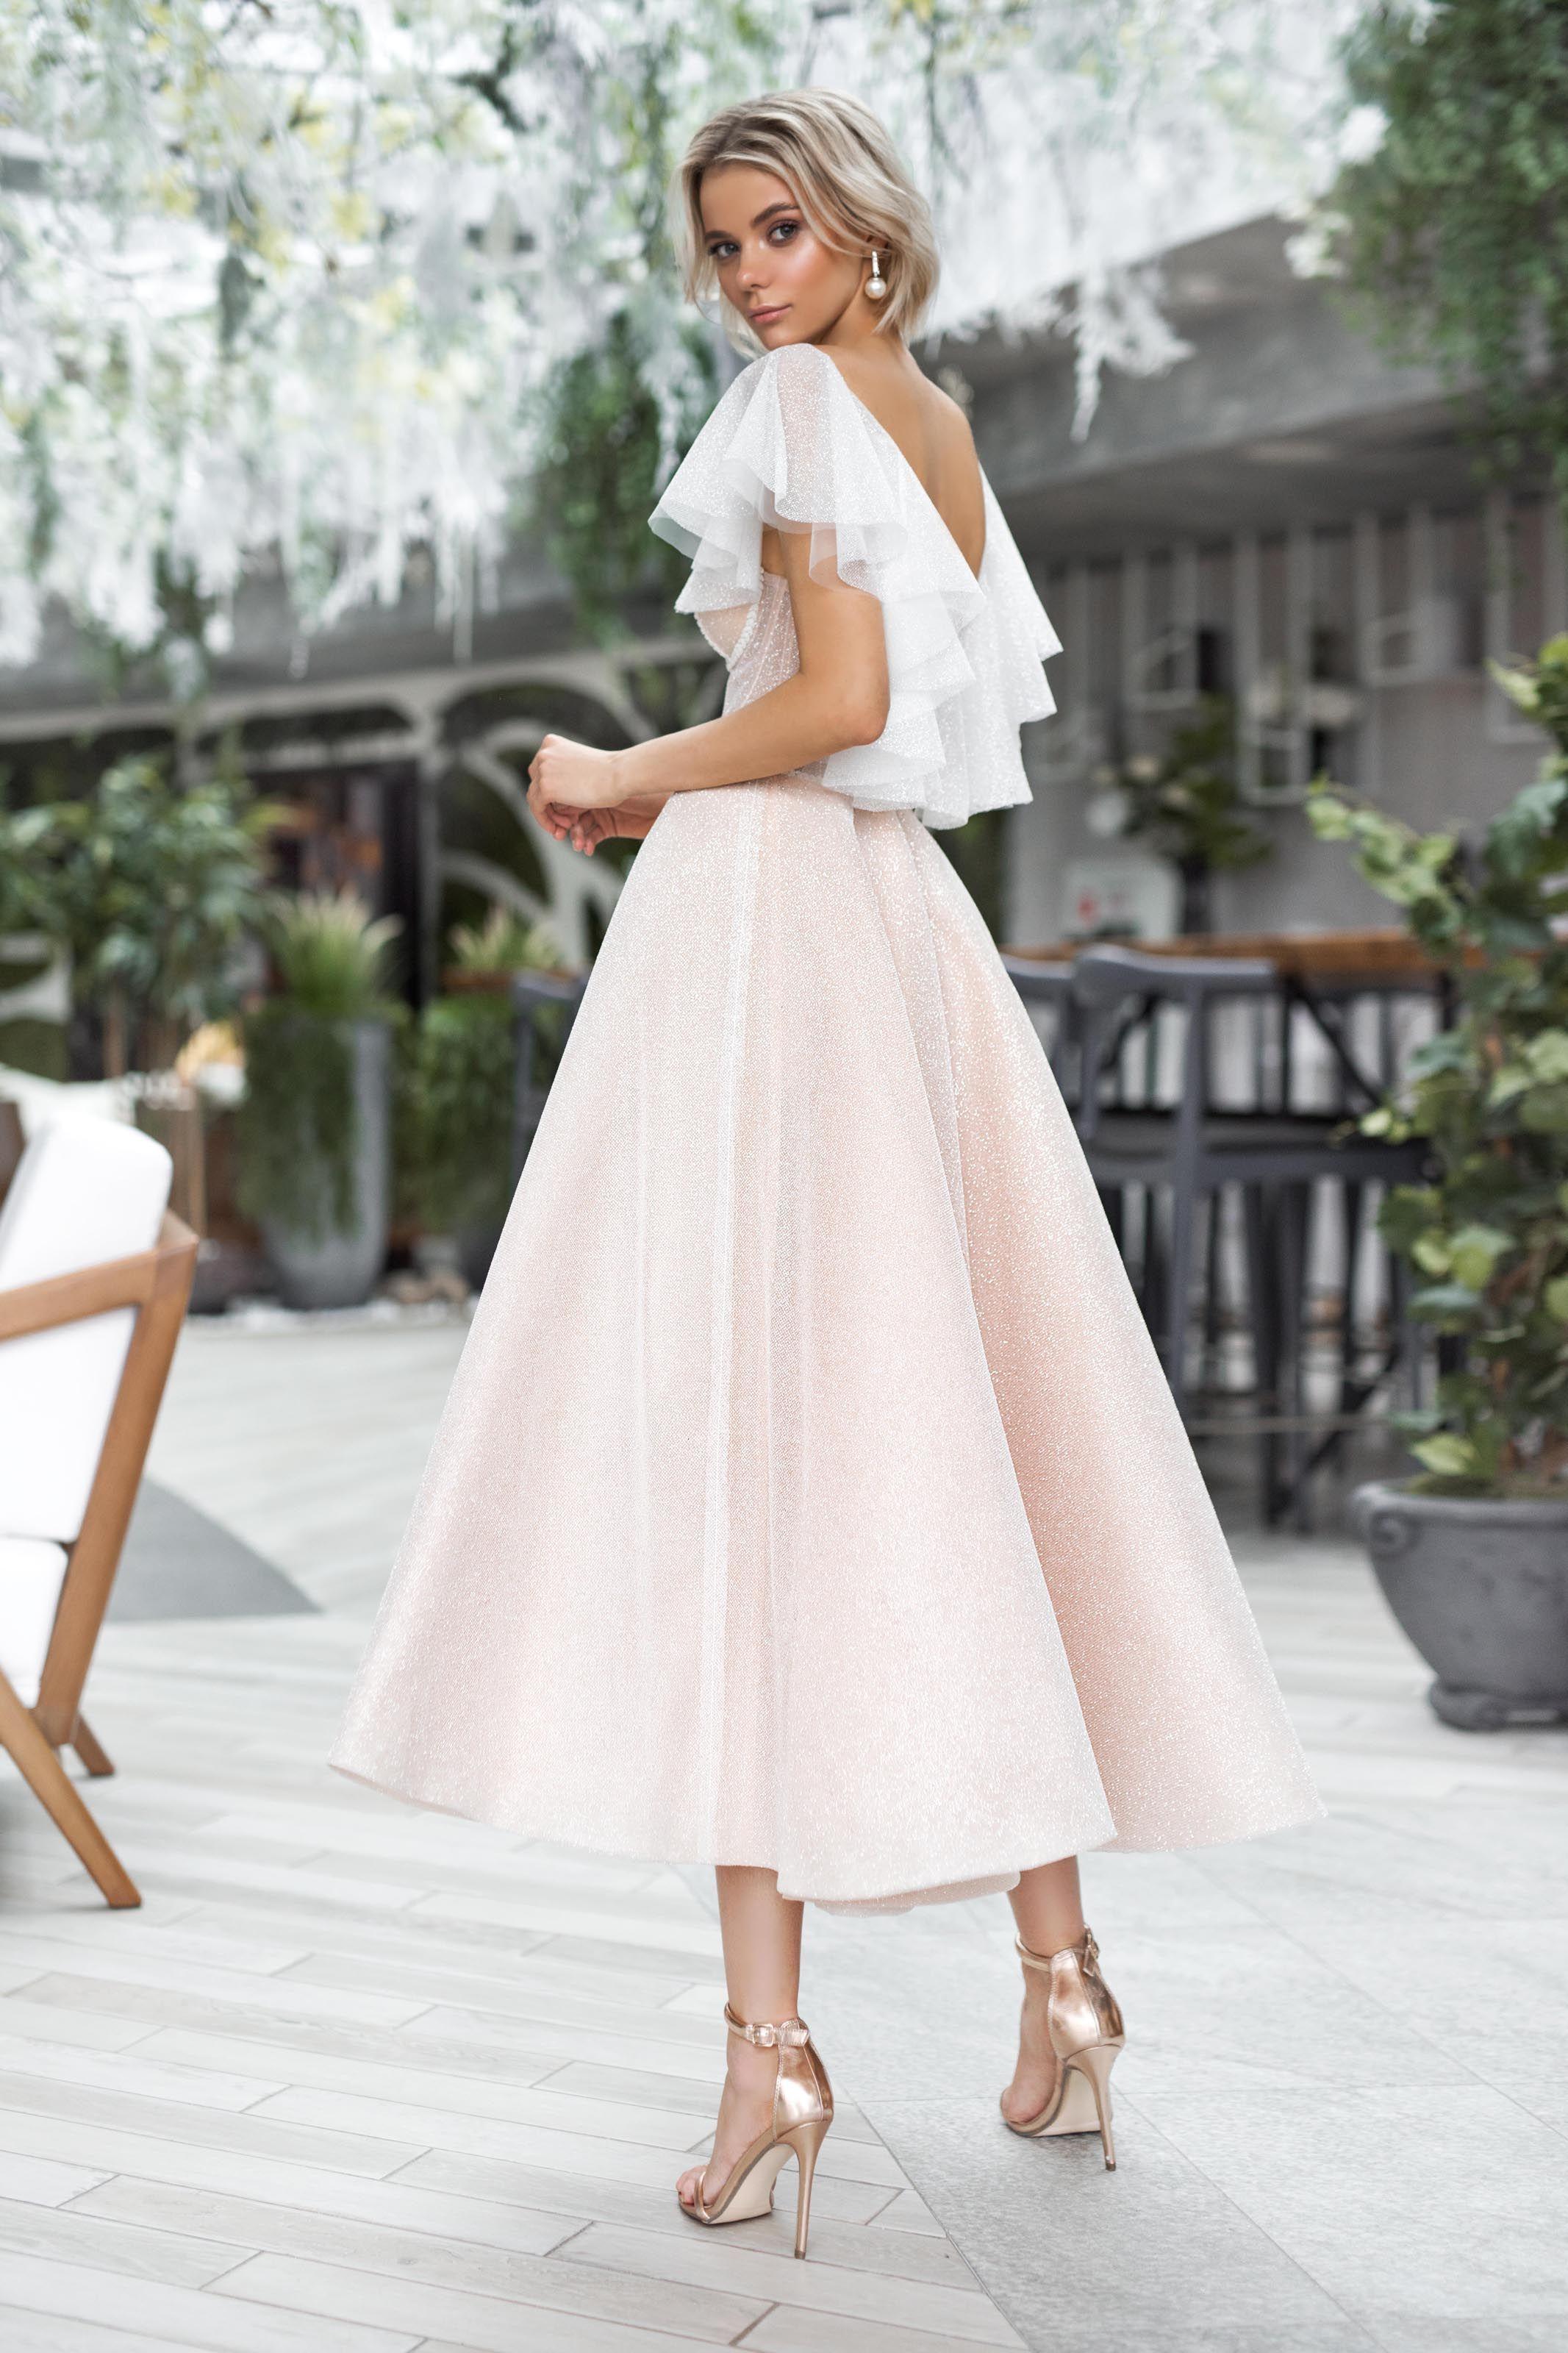 Wedding Gown Strekoza Selesta Luxx Nova Beach Wedding Dress Boho Midi Wedding Dress Beach Wedding Dress [ 3200 x 2133 Pixel ]